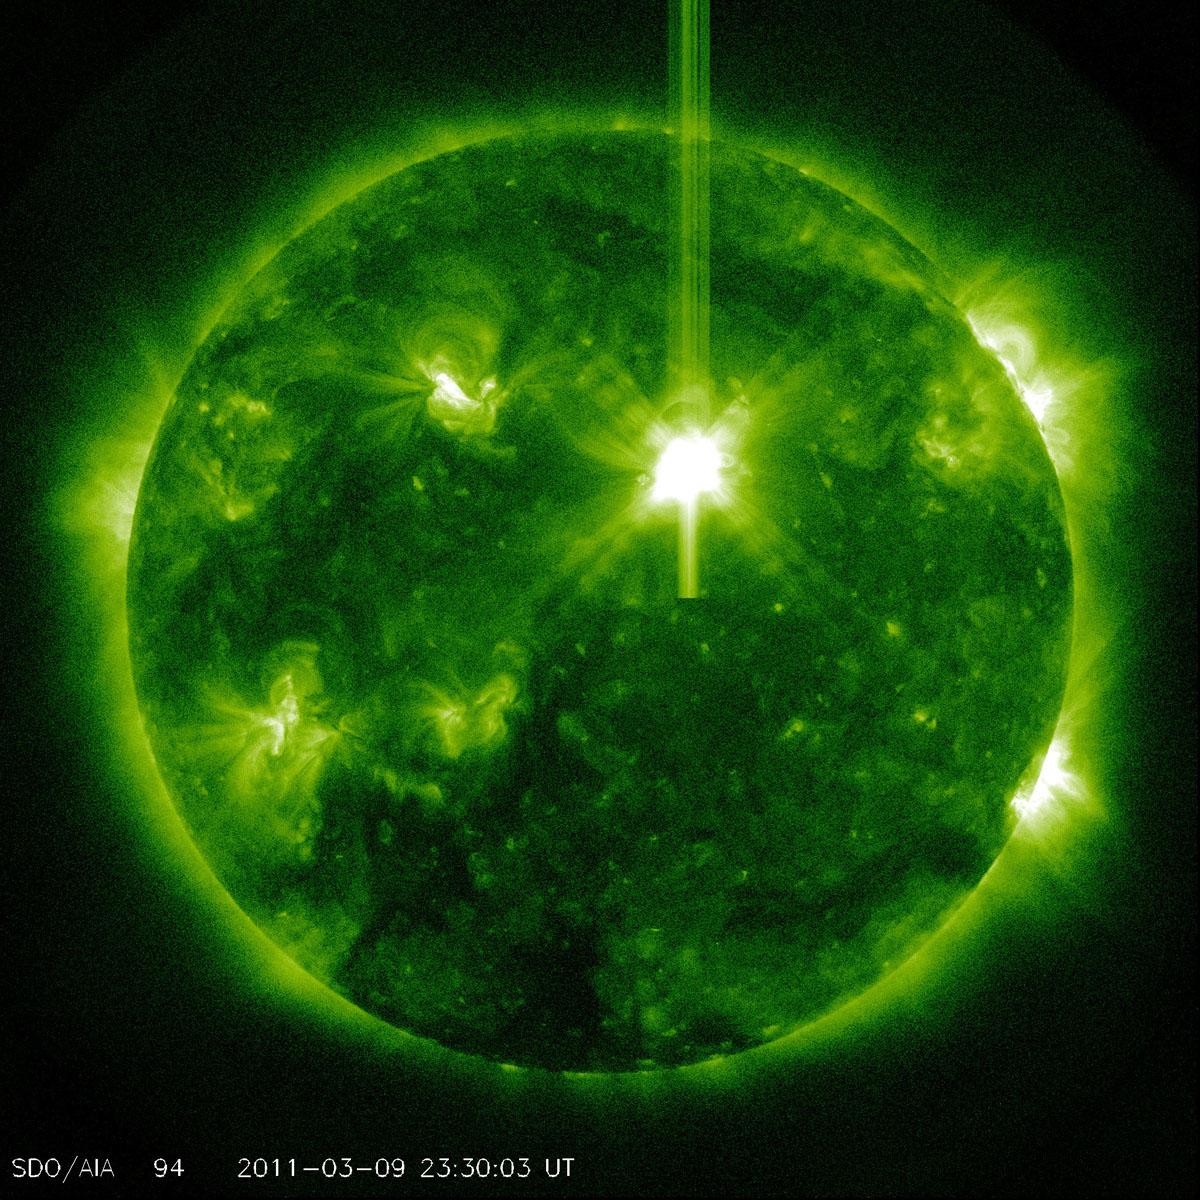 Major Solar Flare Erupts, May Make Auroras Visible in Northern U.S.